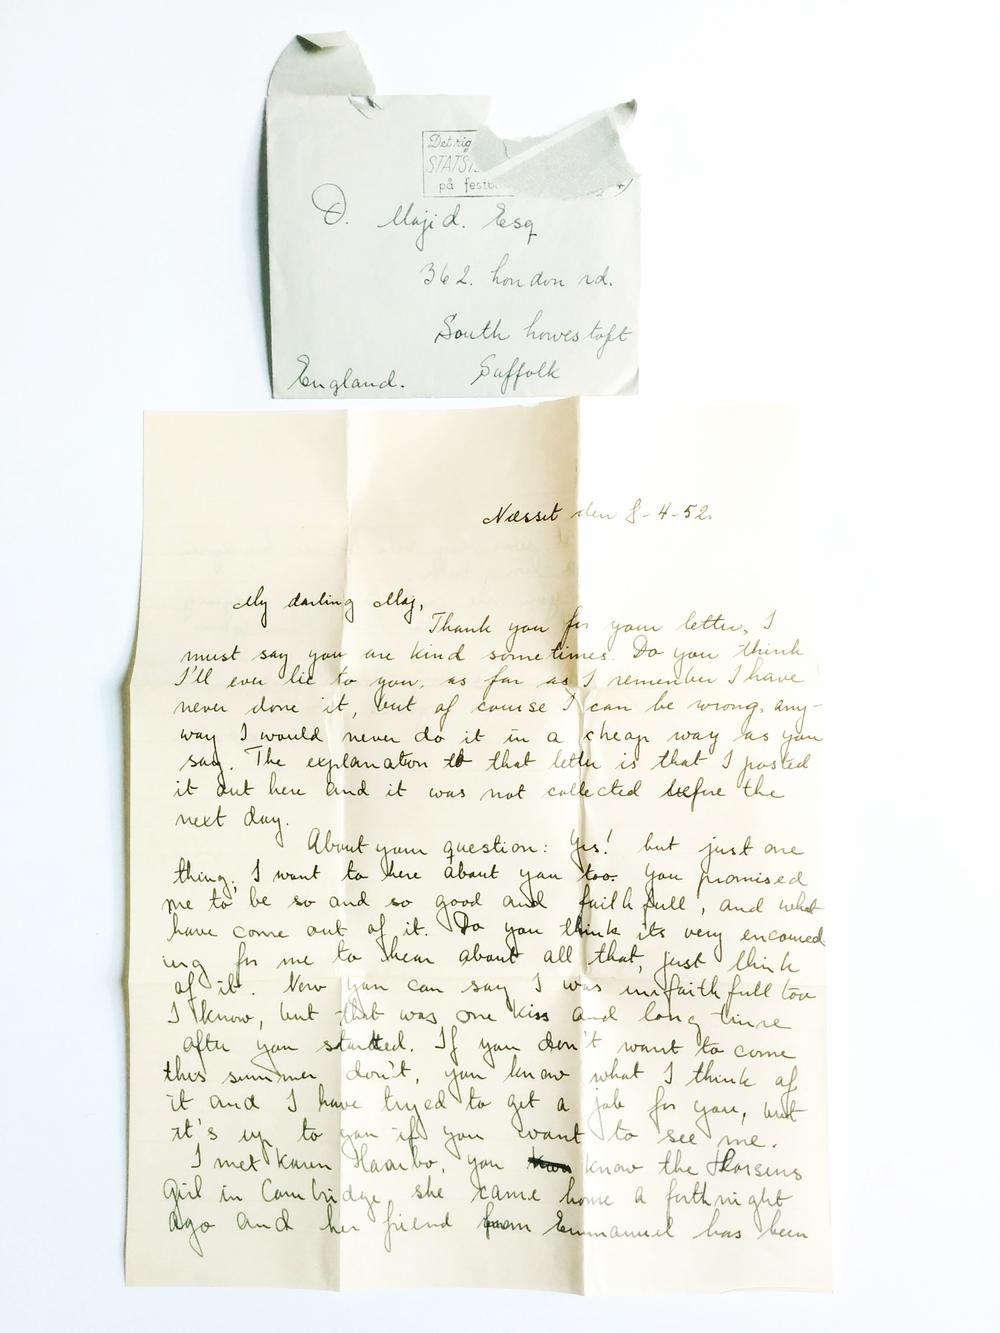 April 8th, 1952